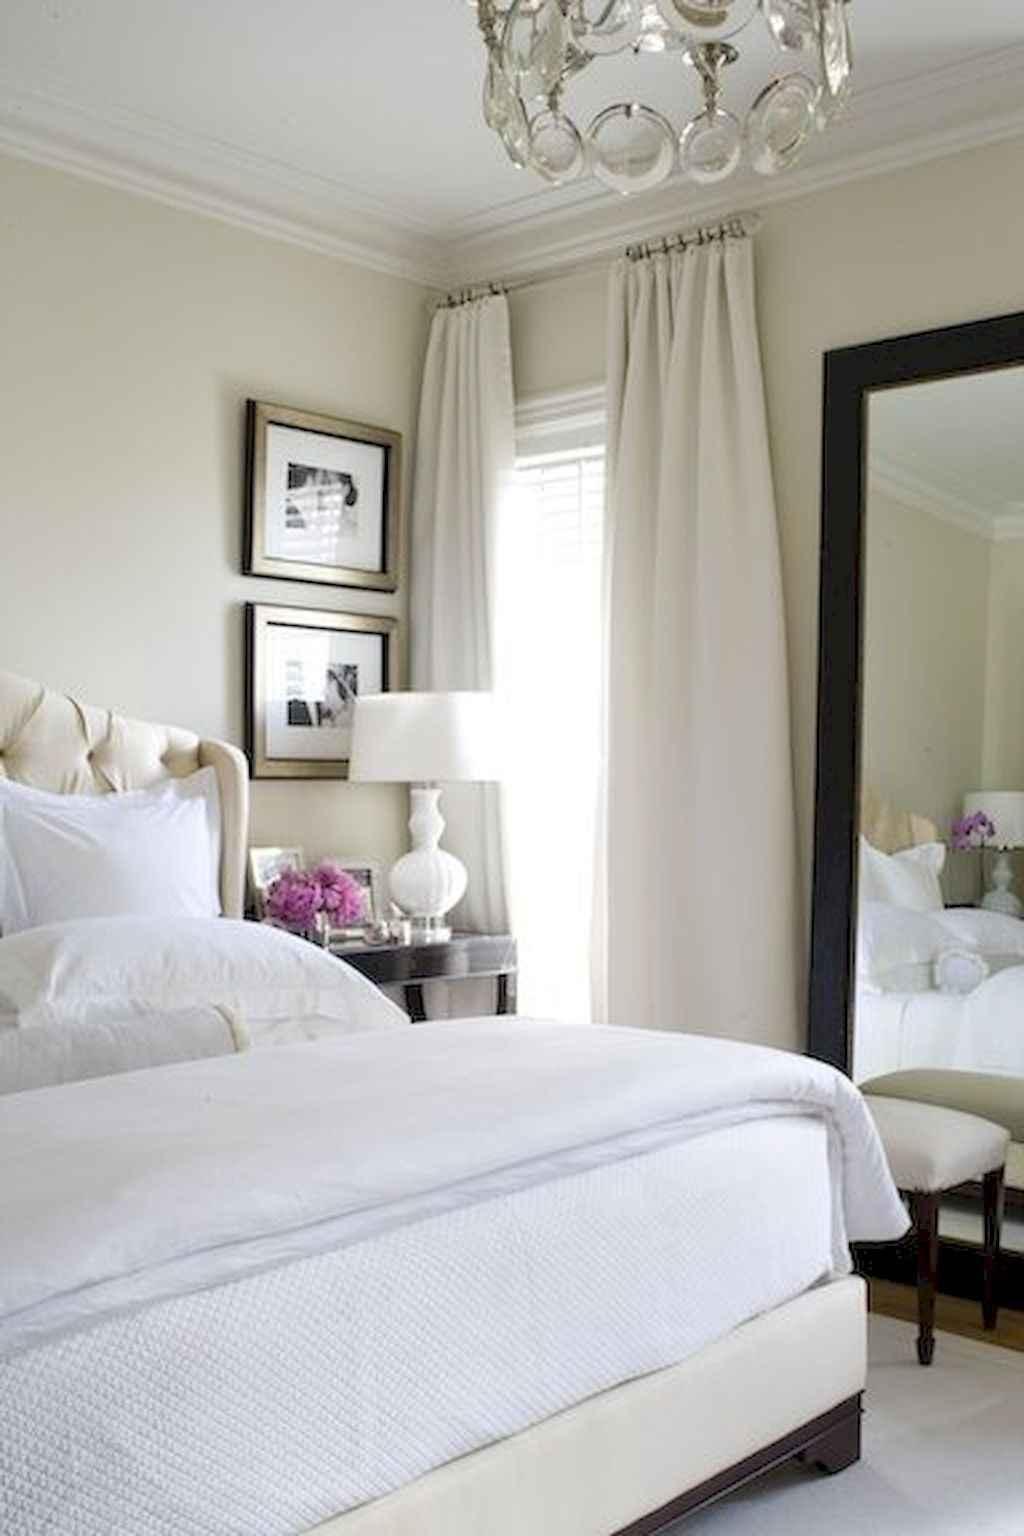 Incredible master bedroom ideas (24)